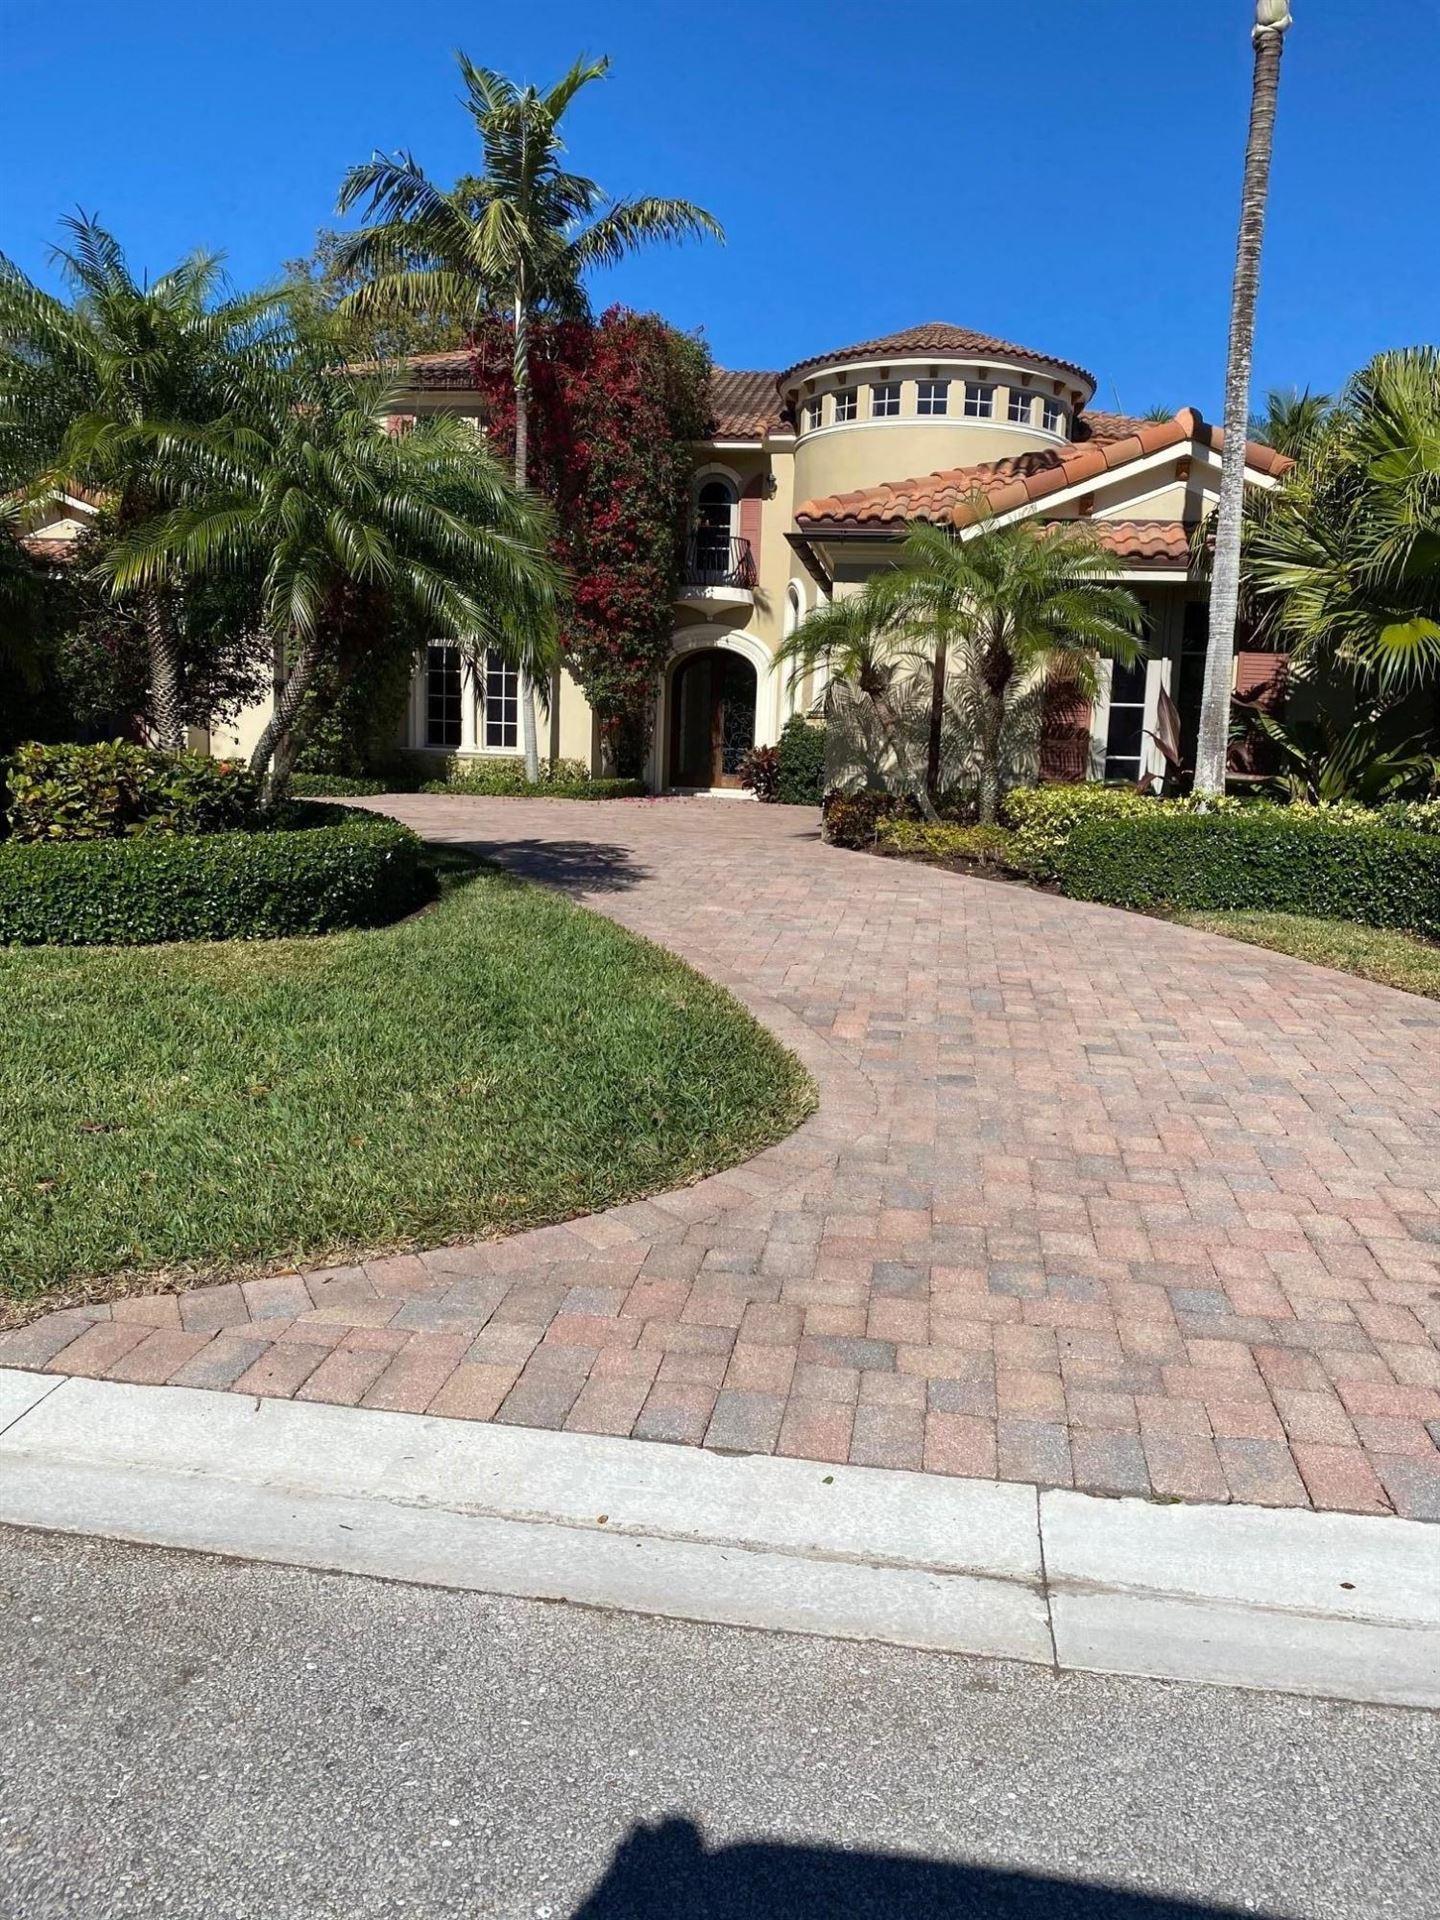 Photo of 13221 Verdun Drive, Palm Beach Gardens, FL 33410 (MLS # RX-10686684)